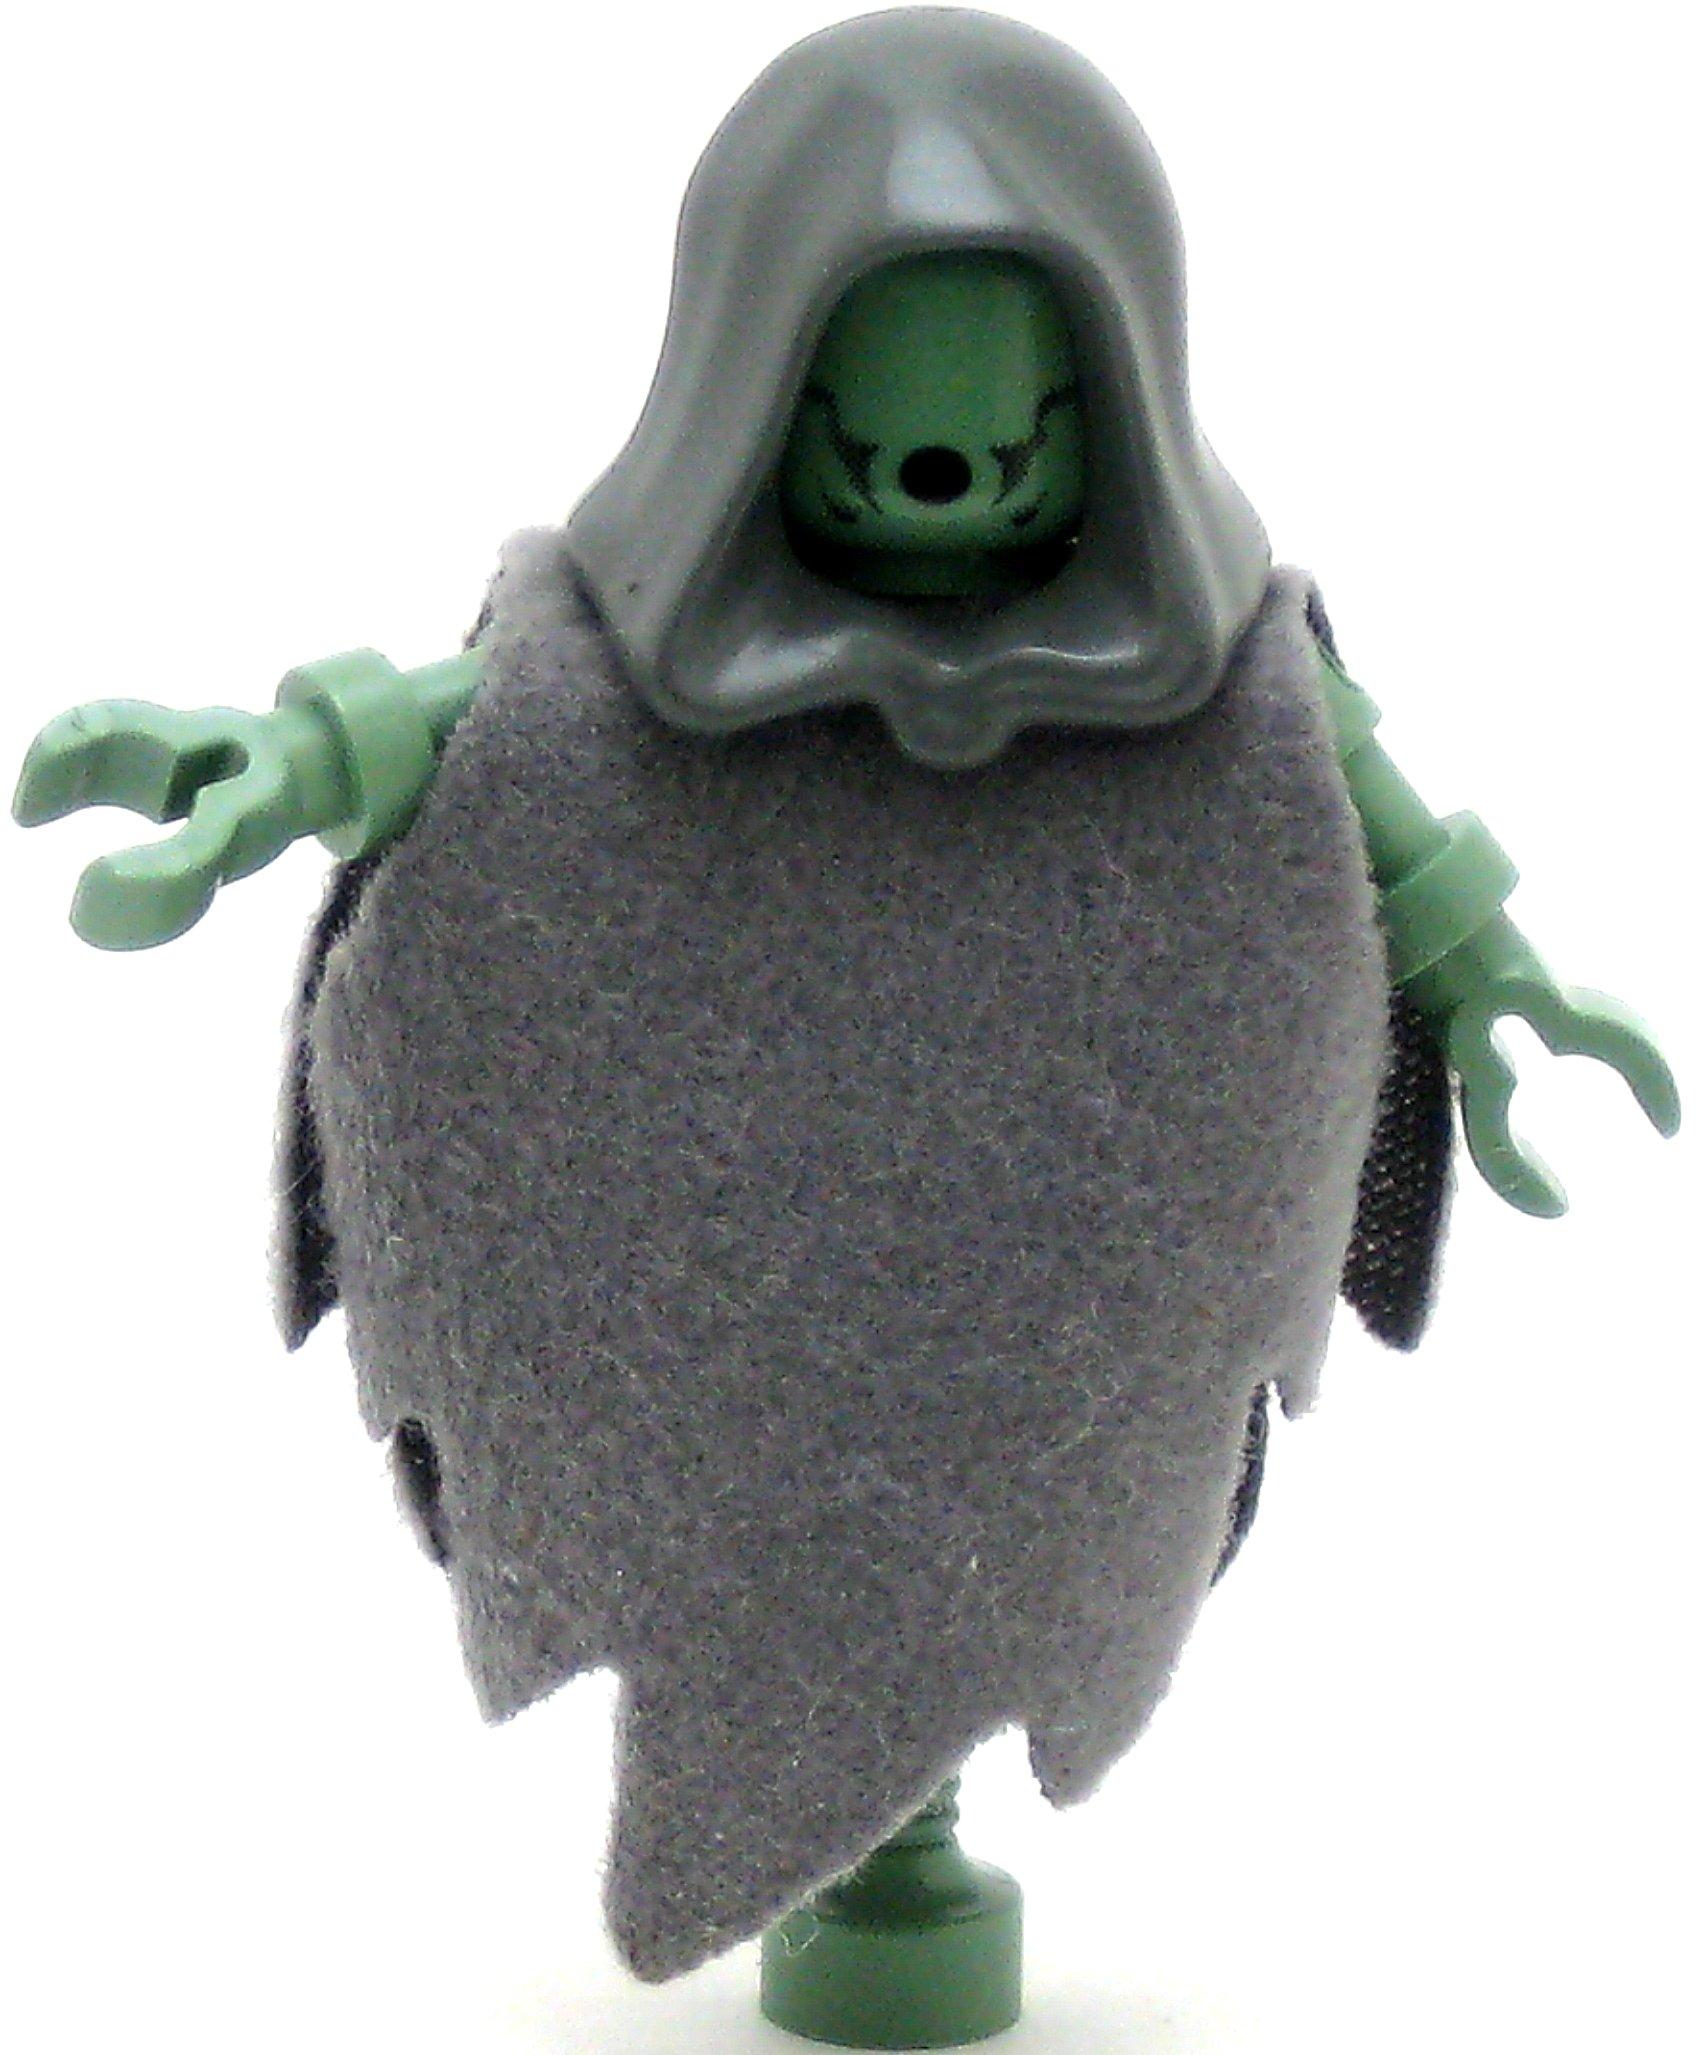 Dementor Schwarz NEU New LEGO Minifigur Harry Potter HP155 Dementor Schwarz